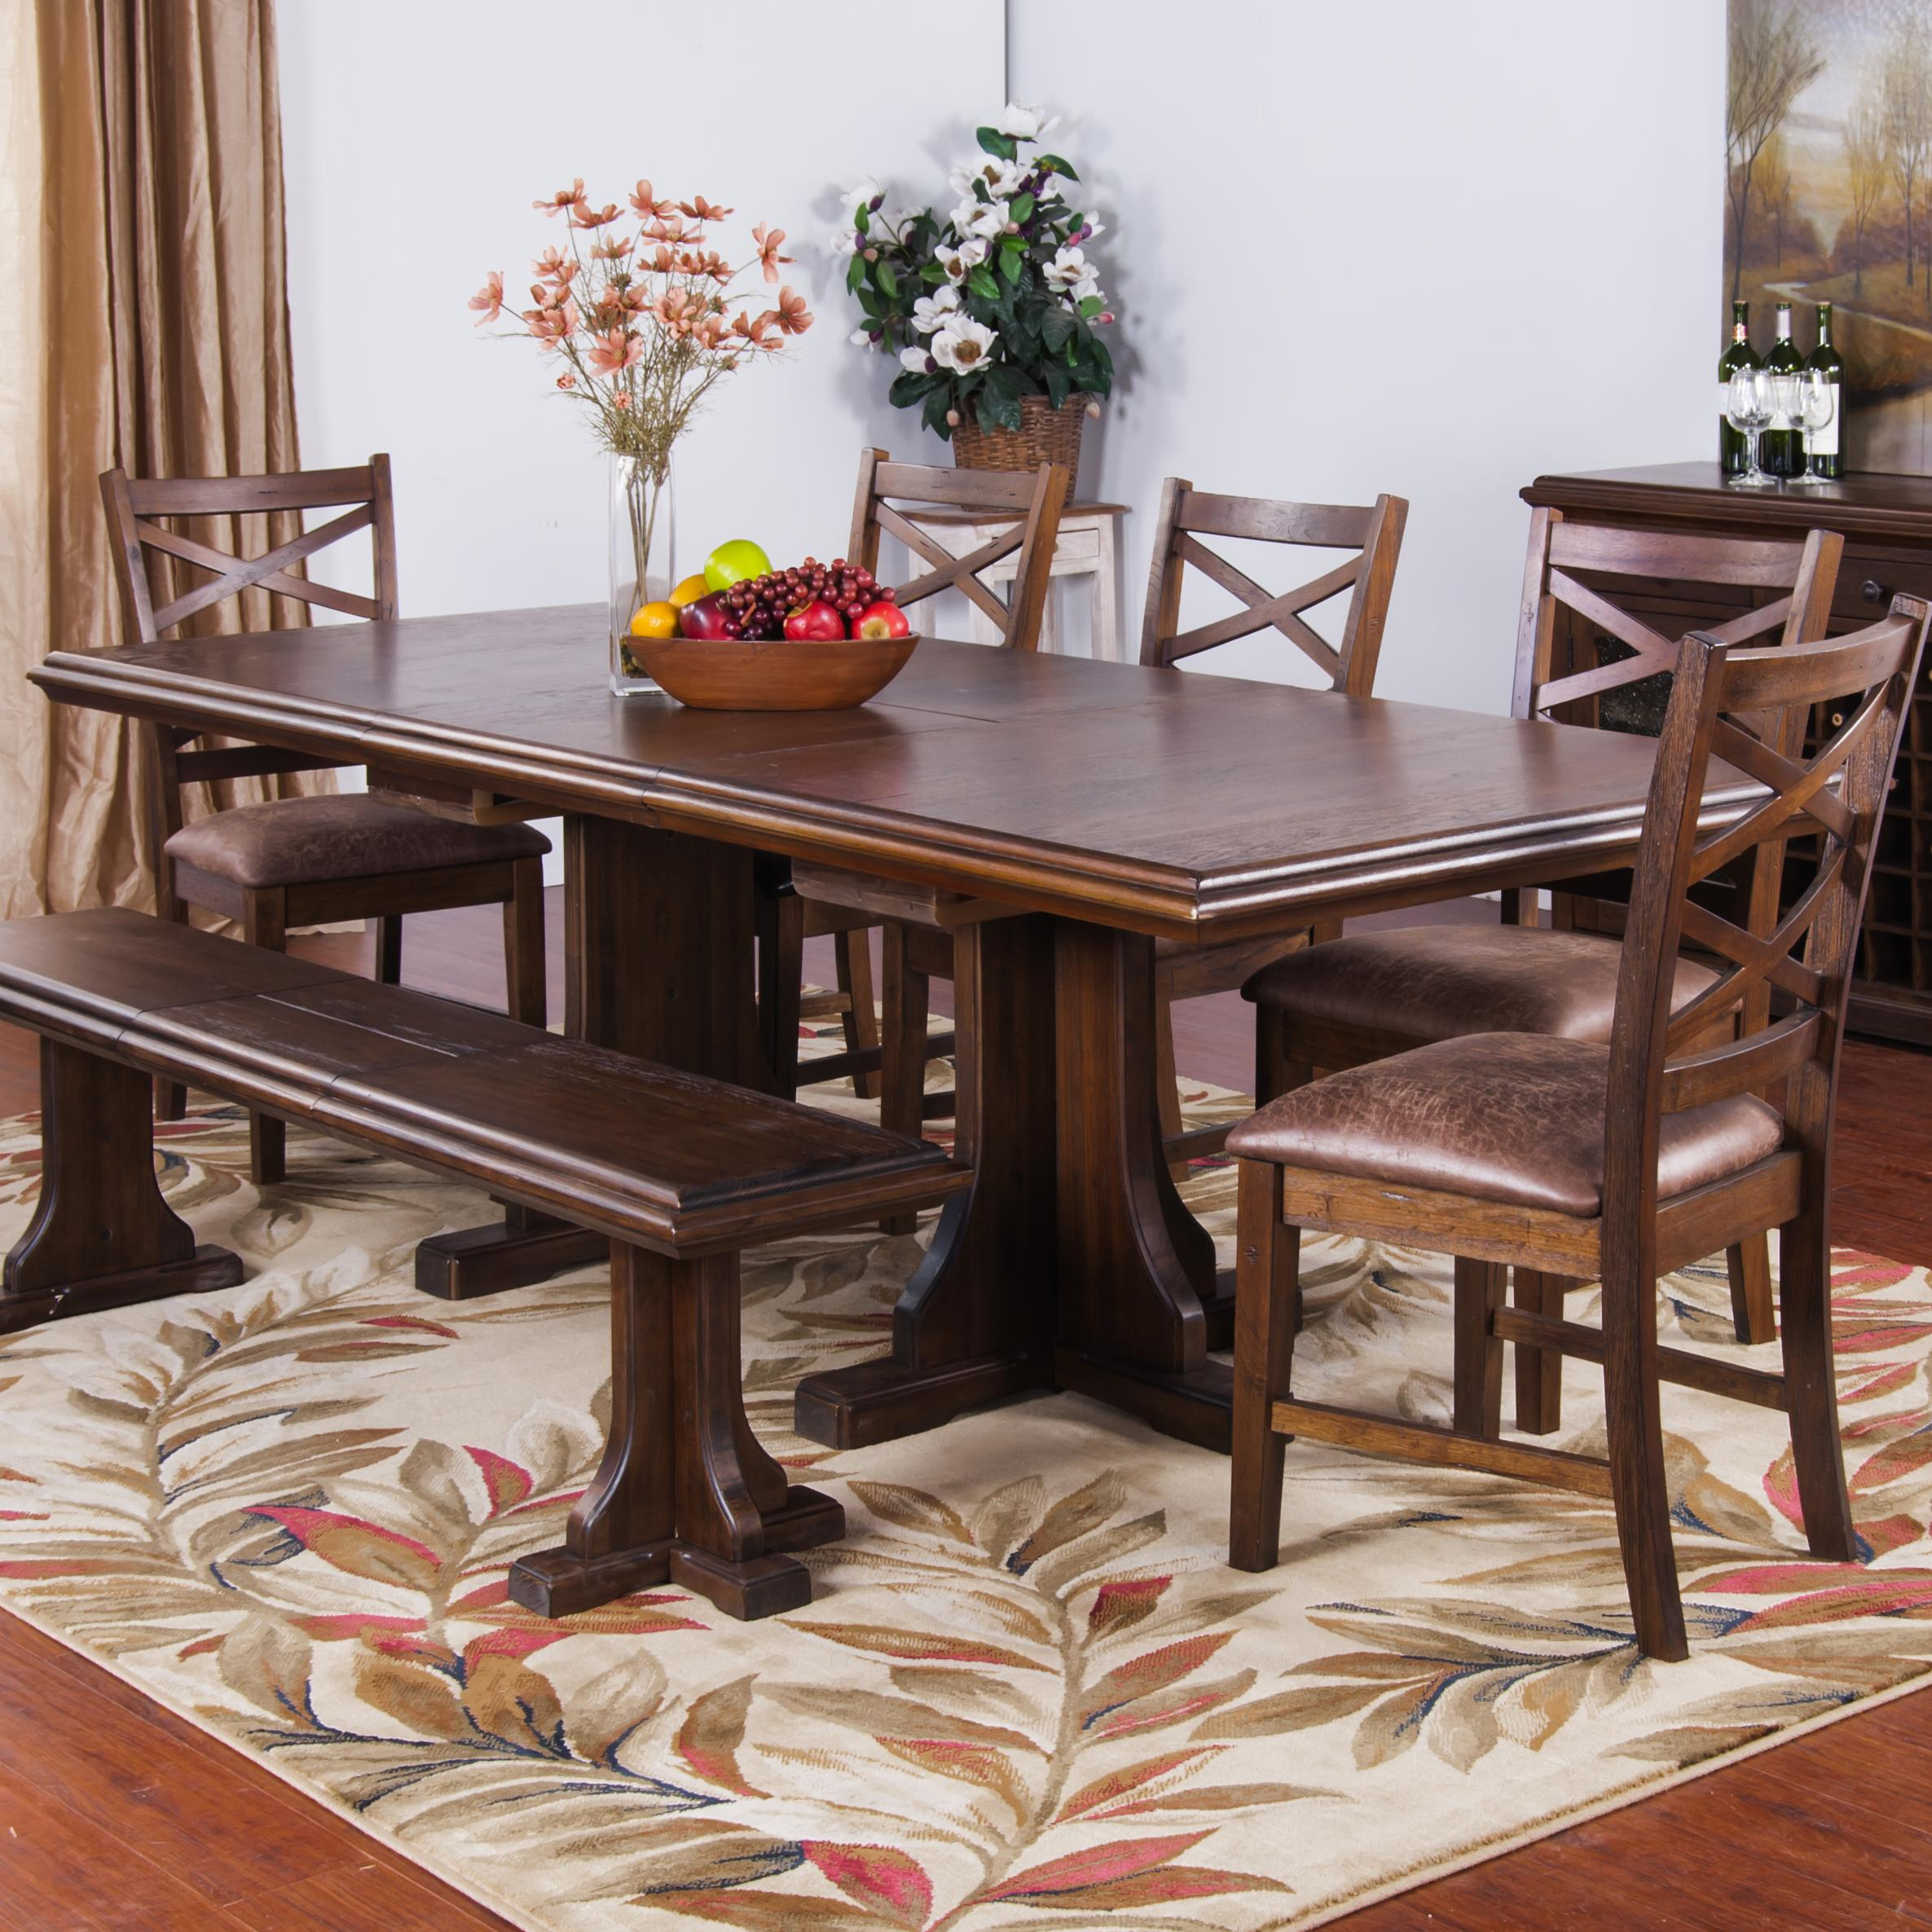 Morris Home Furnishings Shiloh Stratford Table Top & Base - Item Number: 1199AC